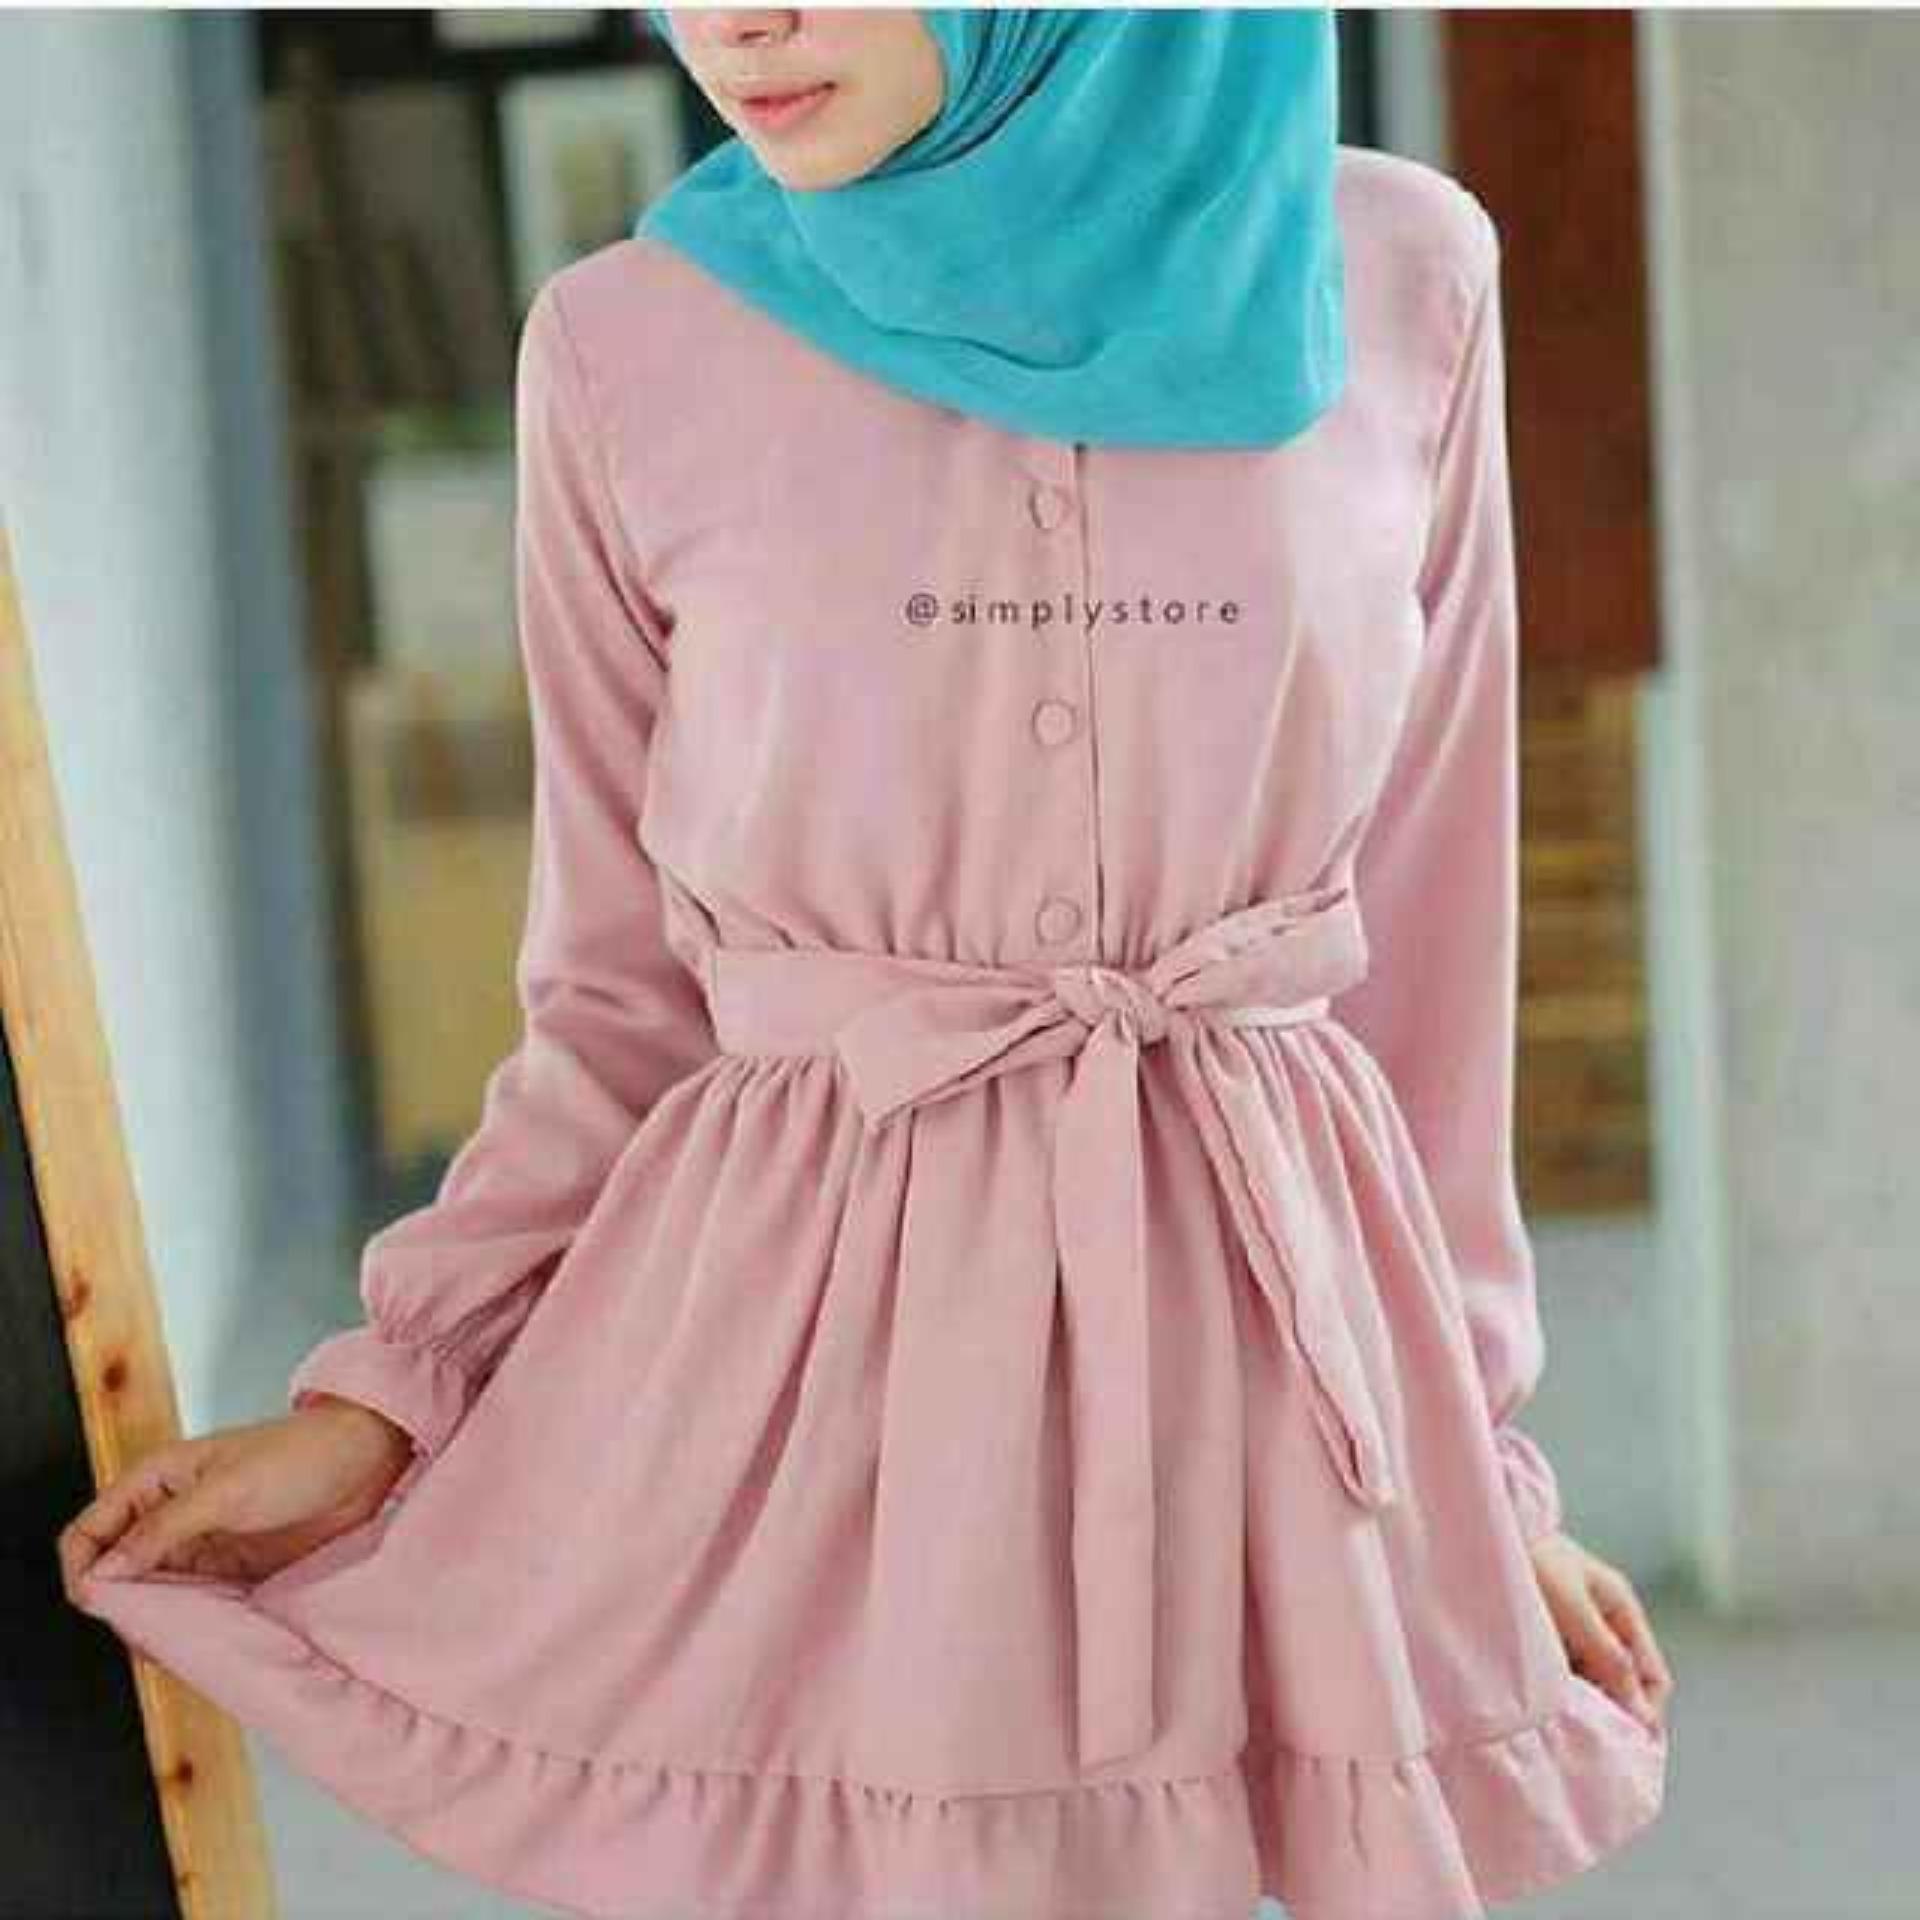 Izzura Tunik Salmon Long Keren Gaul Daftar Candy Dress Dusty Pink Sj0015 Baju Original Dewita Atasan Wanita Muslim Panjangpakaian Kerja Santai Casual